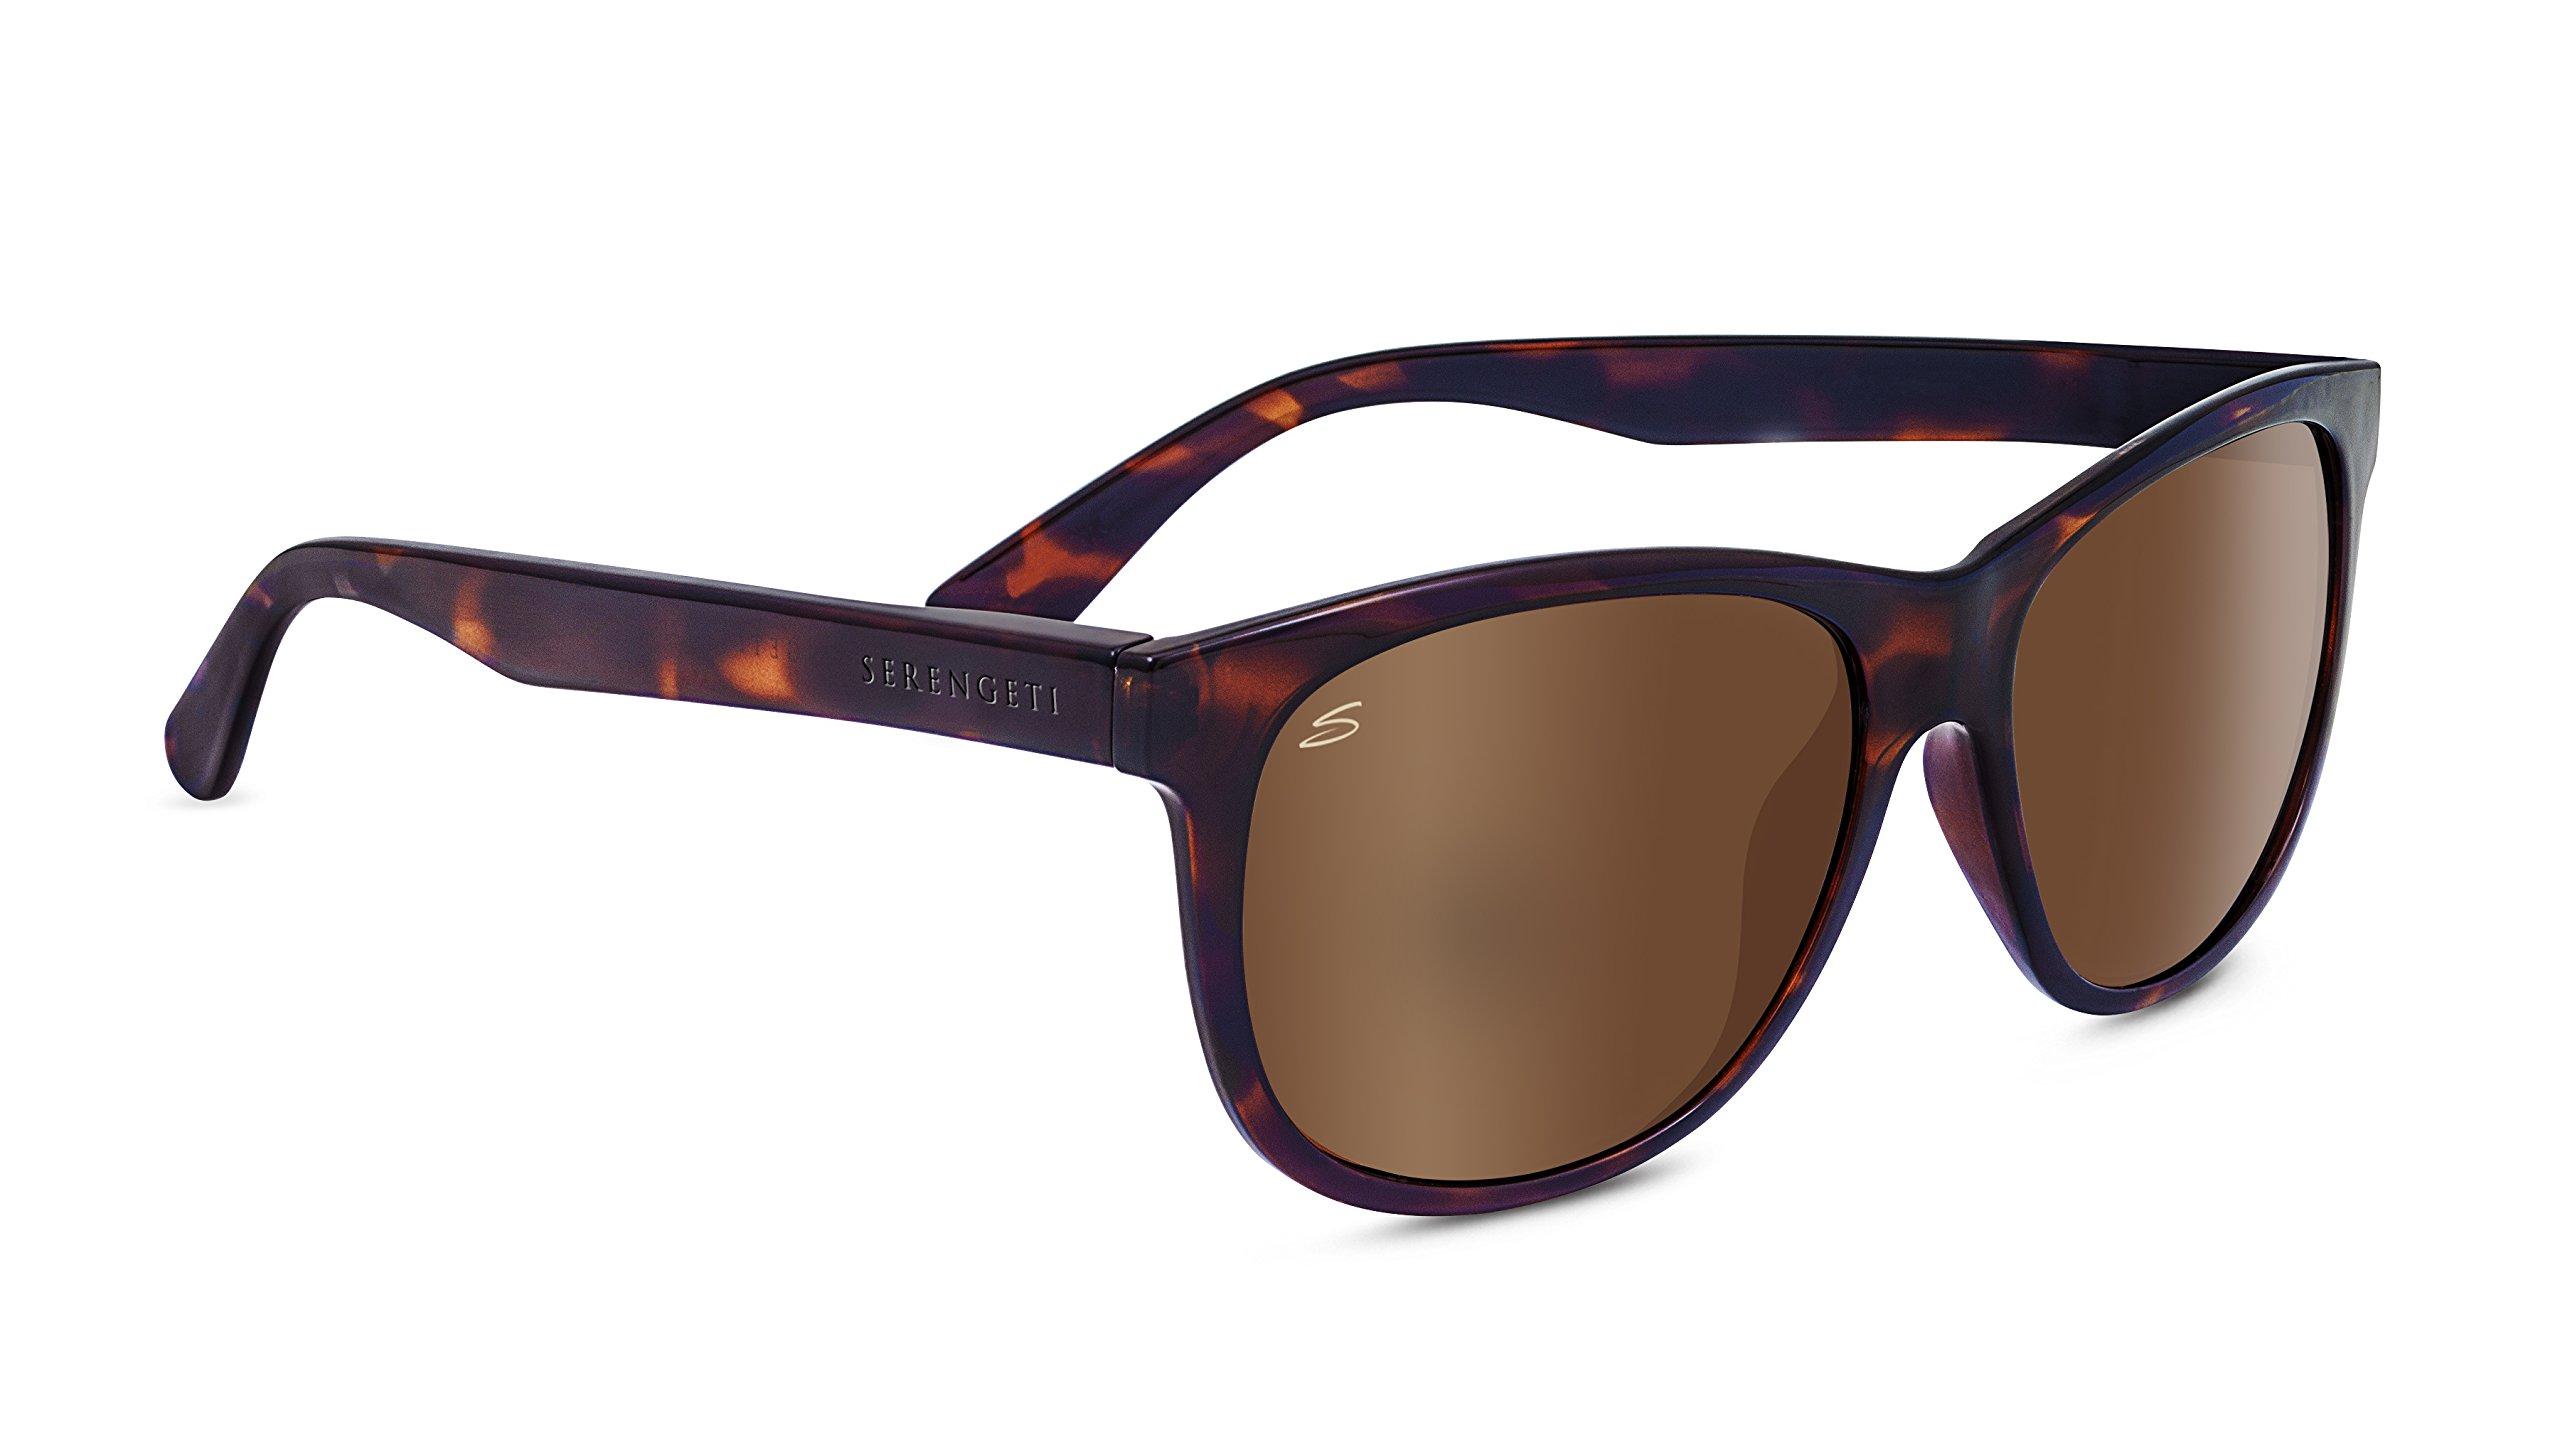 Serengeti 8361 Ostuni Polarized Drivers Sunglasses, Shiny Dark Tortoise Frame by Serengeti (Image #1)